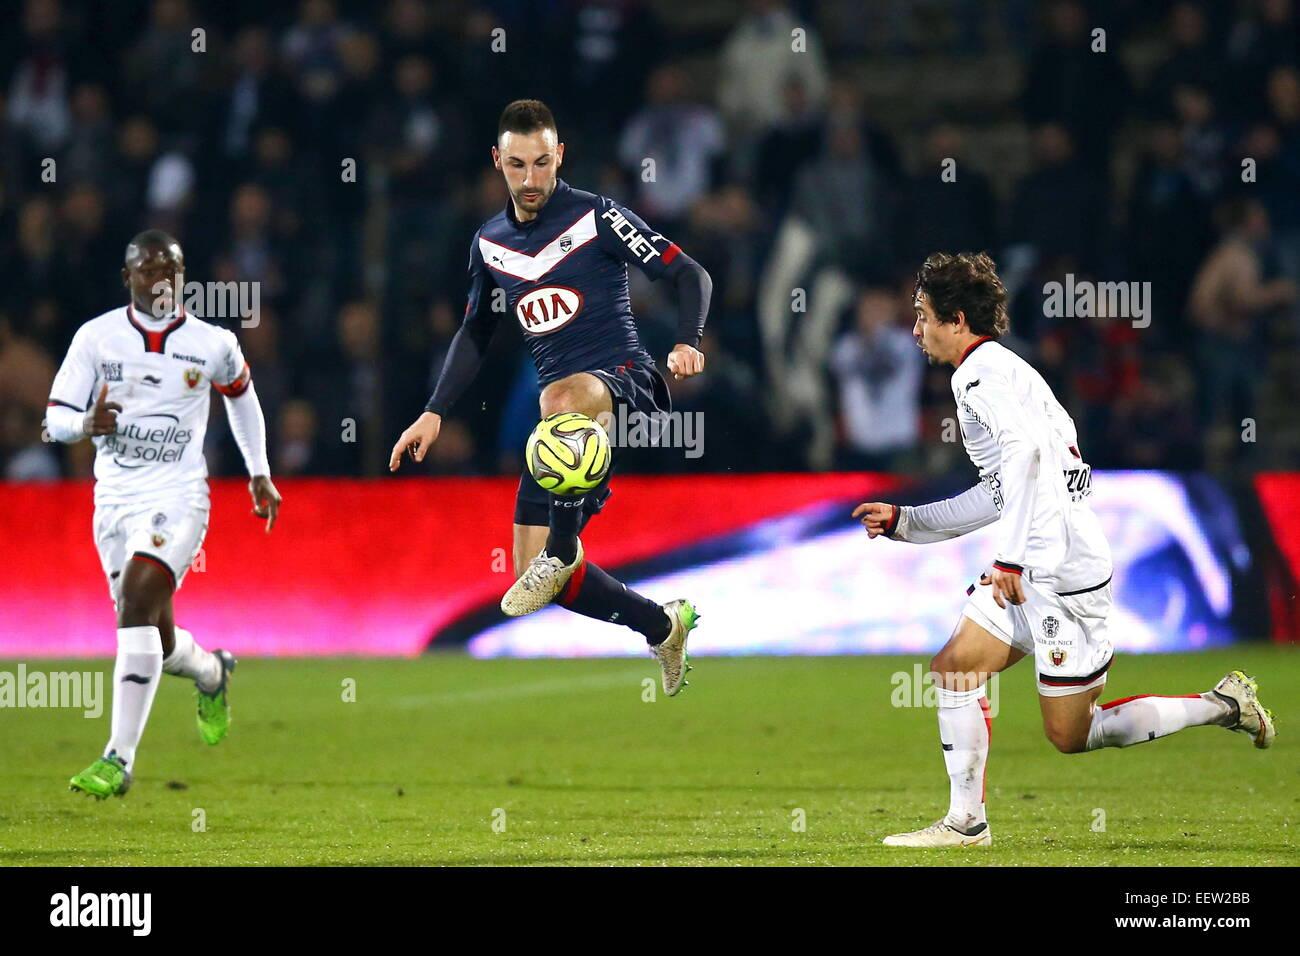 Diego Contento/Gregoire Puel - 16.01.2015 - Bordeaux/Nizza - 21e journee Ligue 1.Photo : Manuel Blondau/Icona Sport Immagini Stock